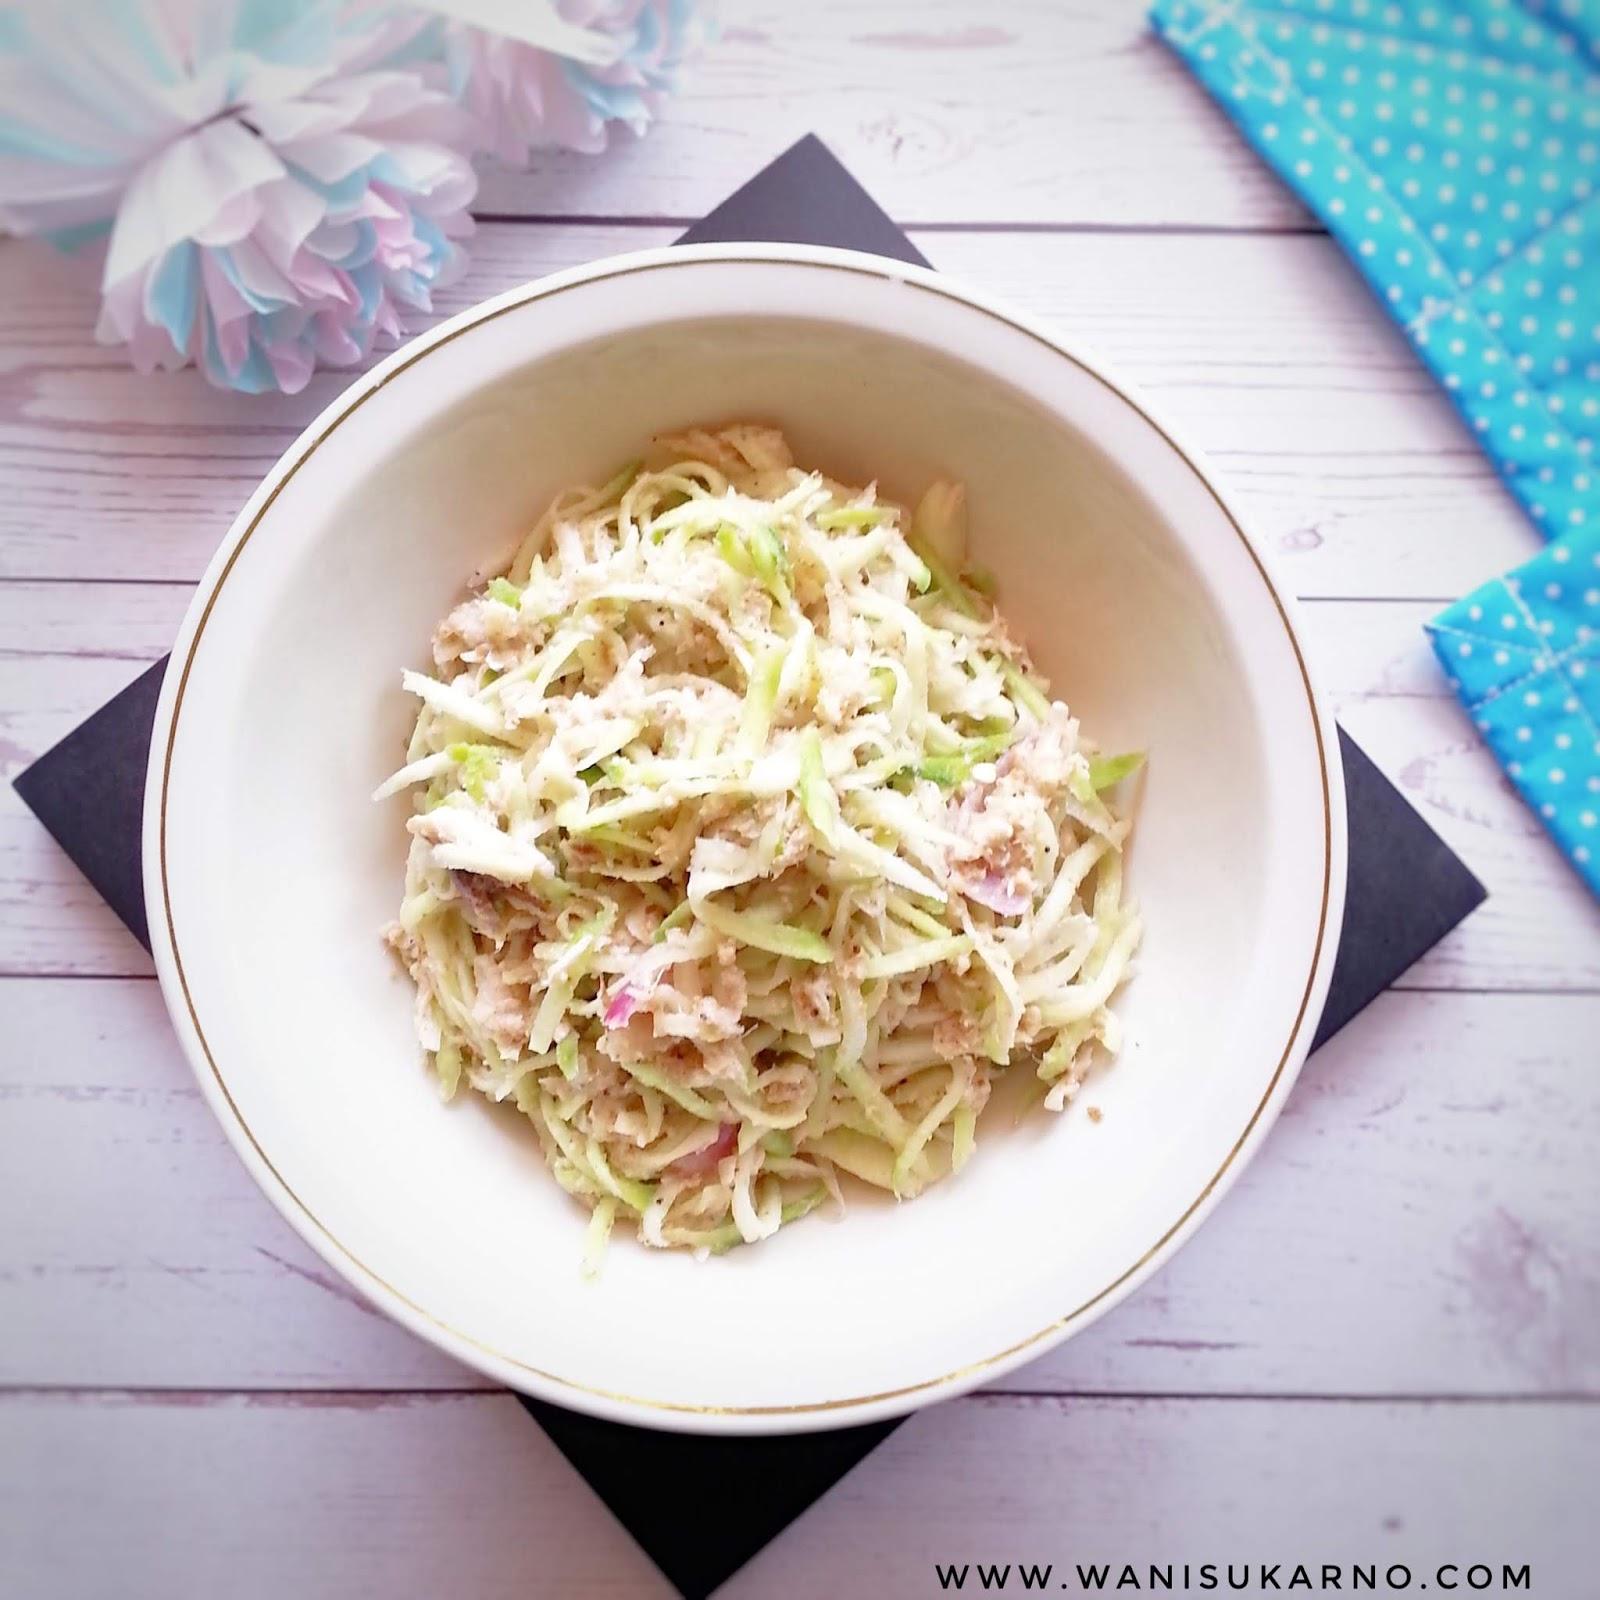 sambal mangga kelantan resepi kerabu perut kelantan resepi bonda kupas mangga muda Resepi Tumpeng Nasi Kuning Enak dan Mudah